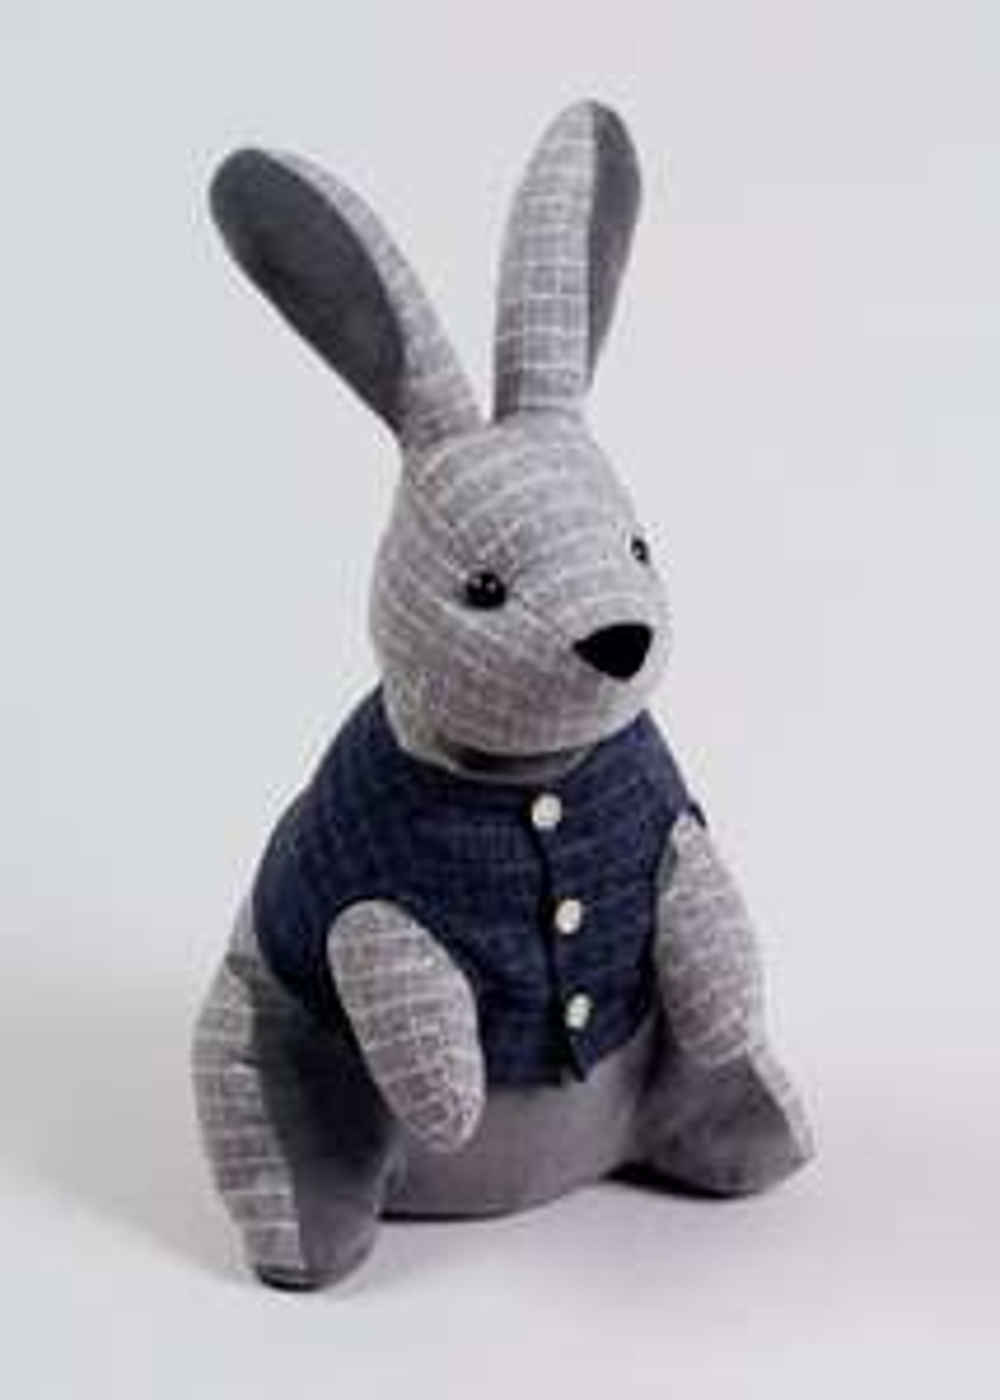 Rabbit Doorstop (44cm x 23cm x 19cm) £5.00 @ Matalan (free C&C)